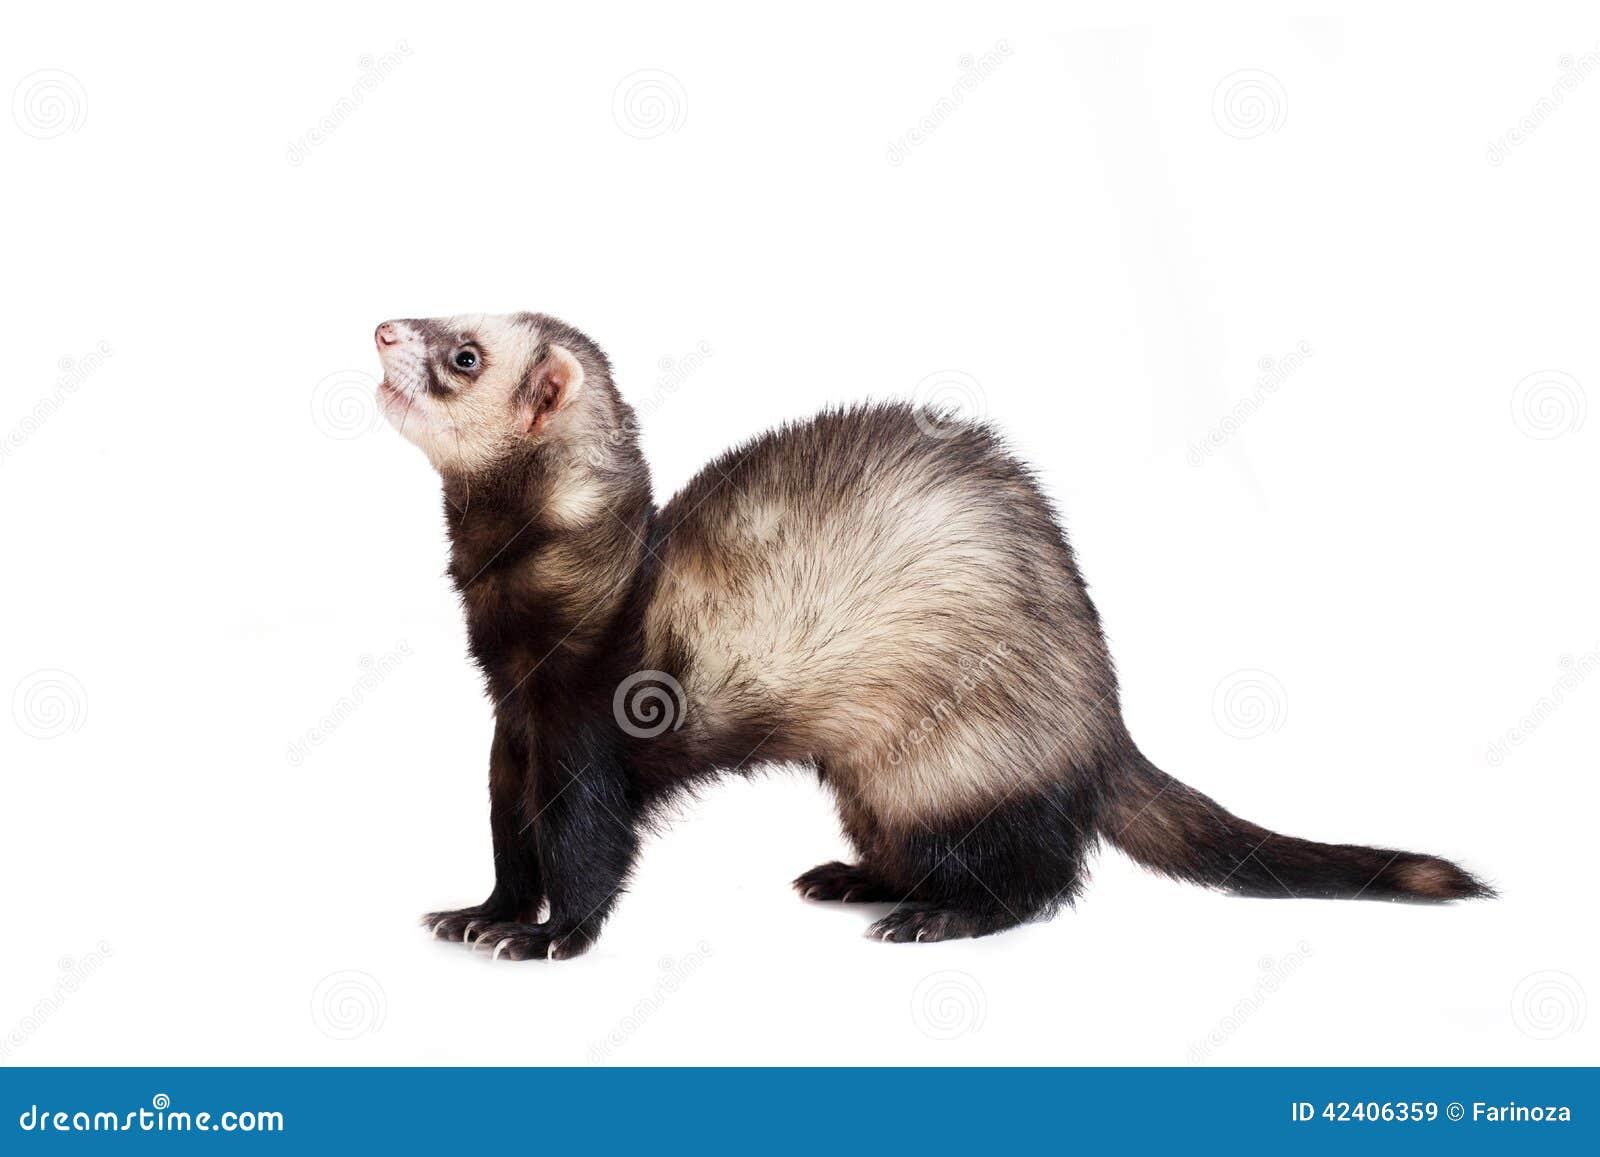 Ferret on white background stock image. Image of brown ... | 1300 x 957 jpeg 76kB